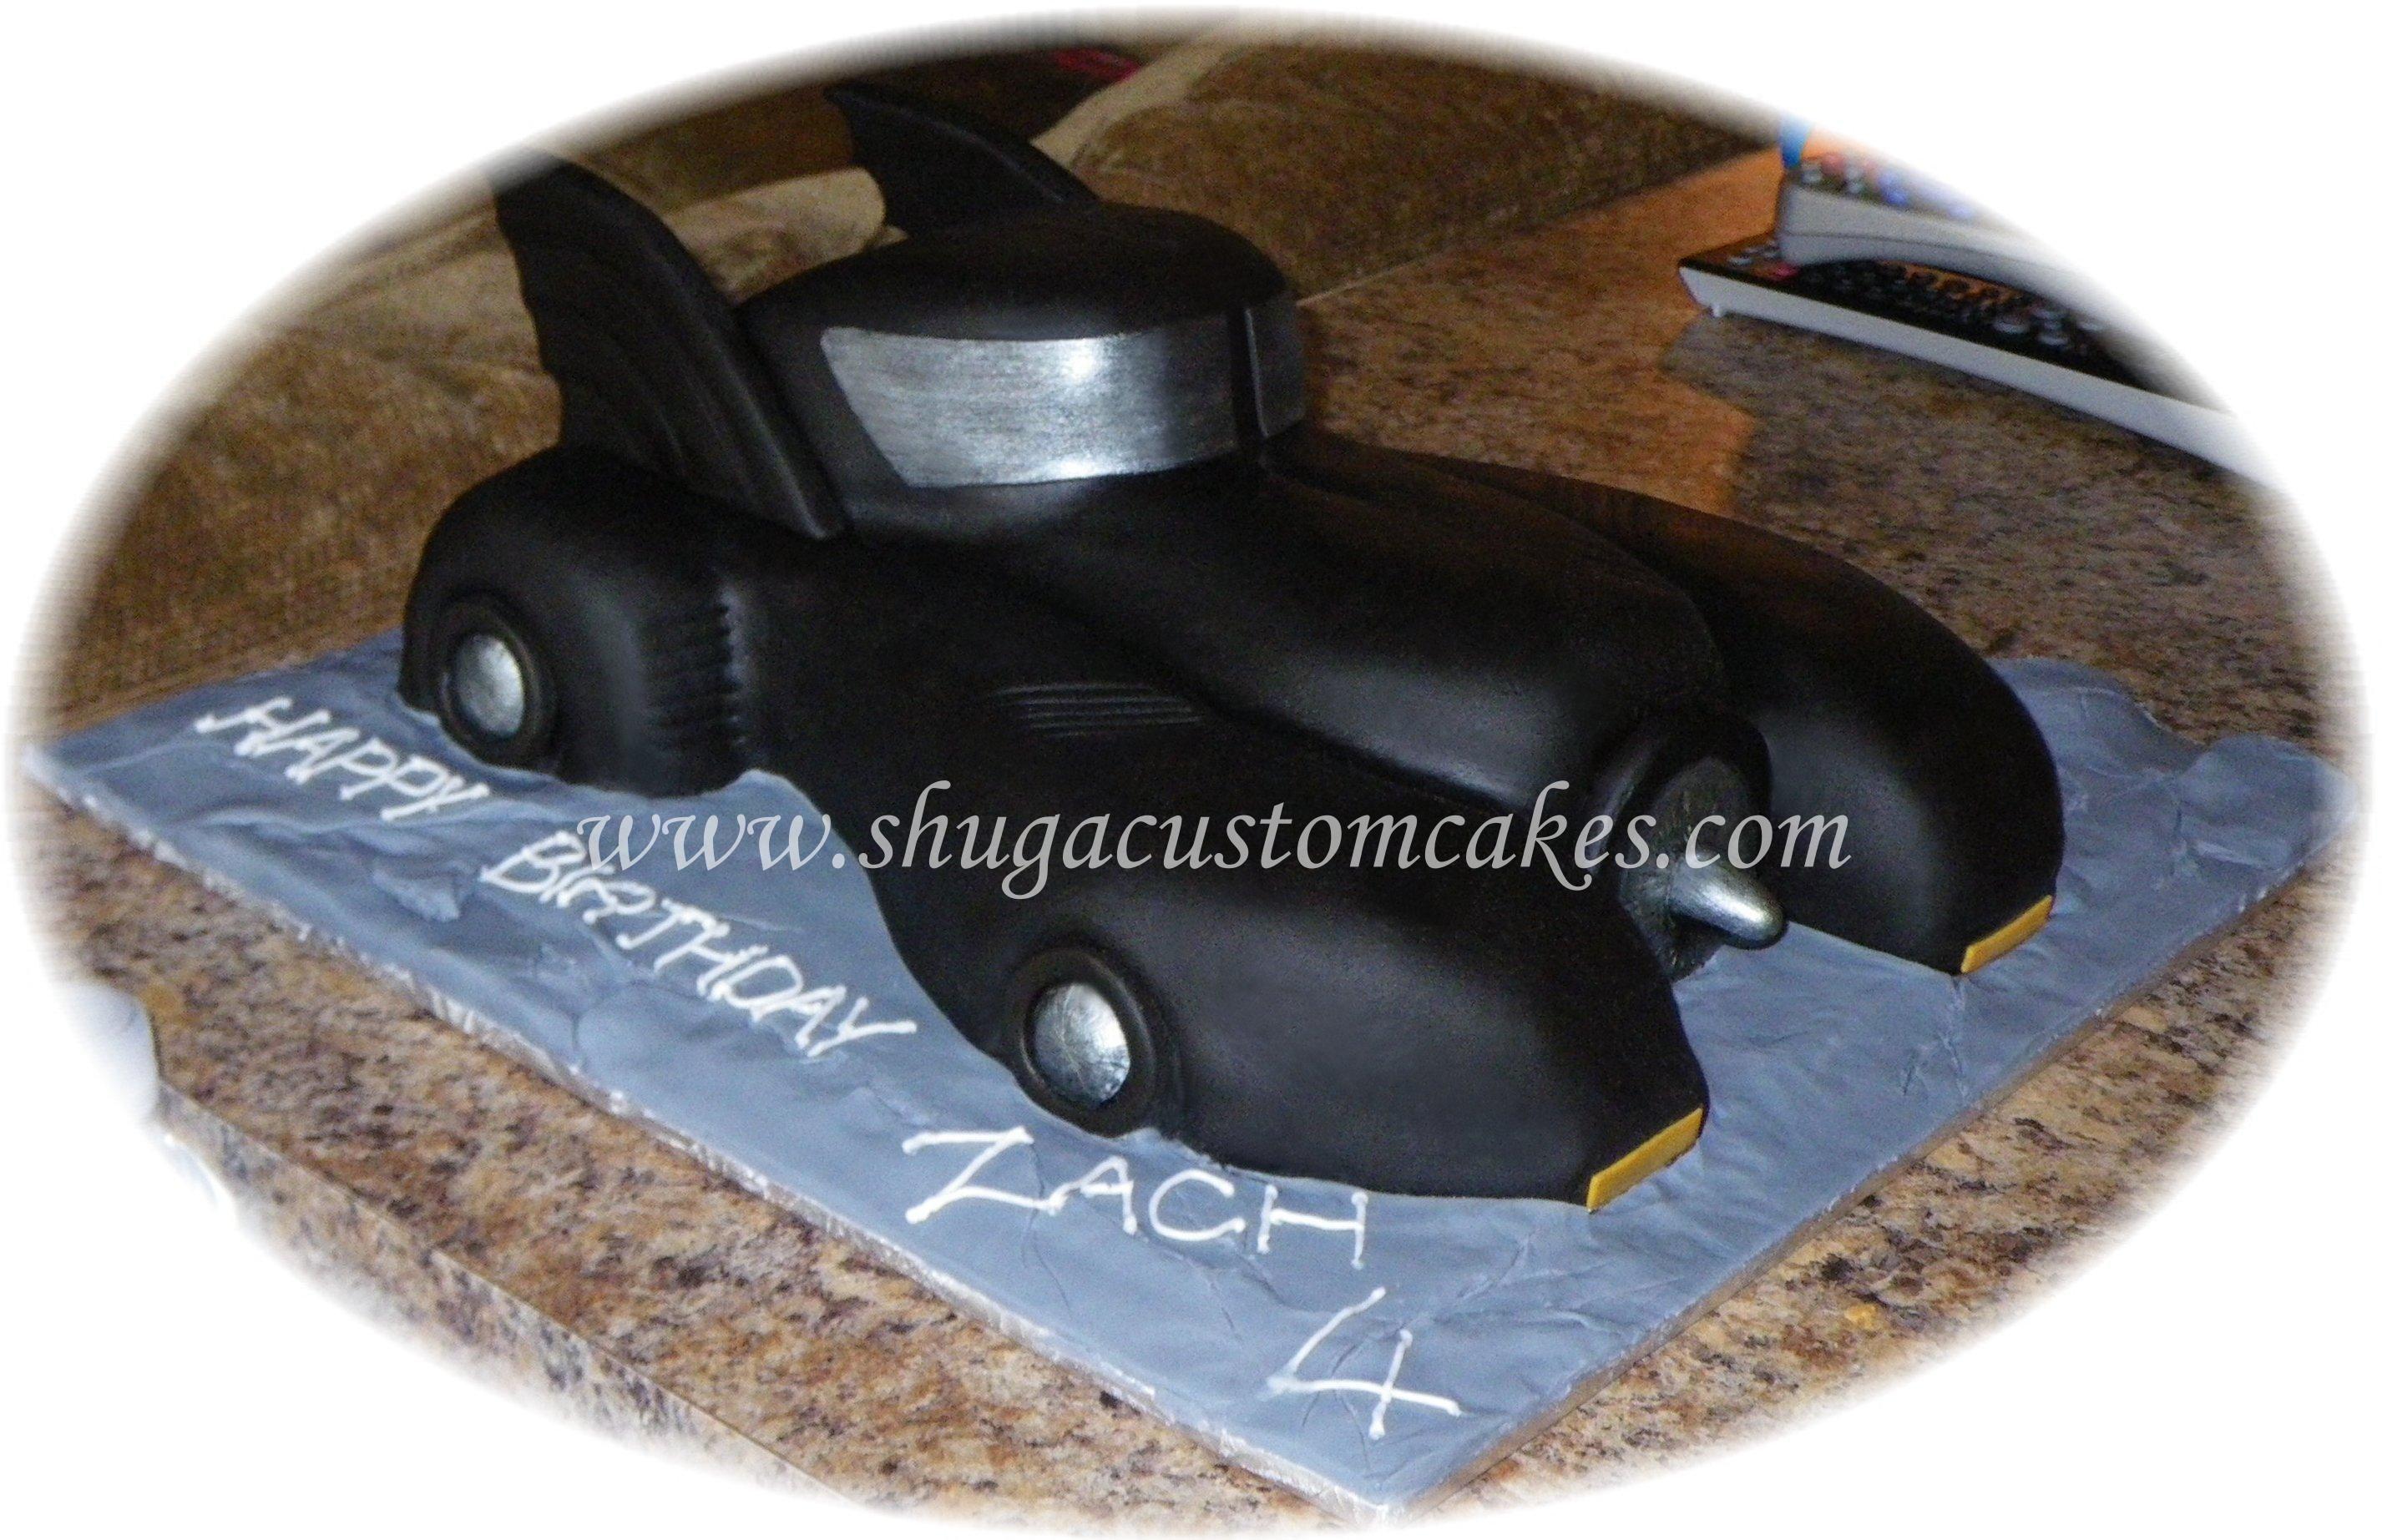 Batmobile cake | Shuga Custom Cakes | Pinterest